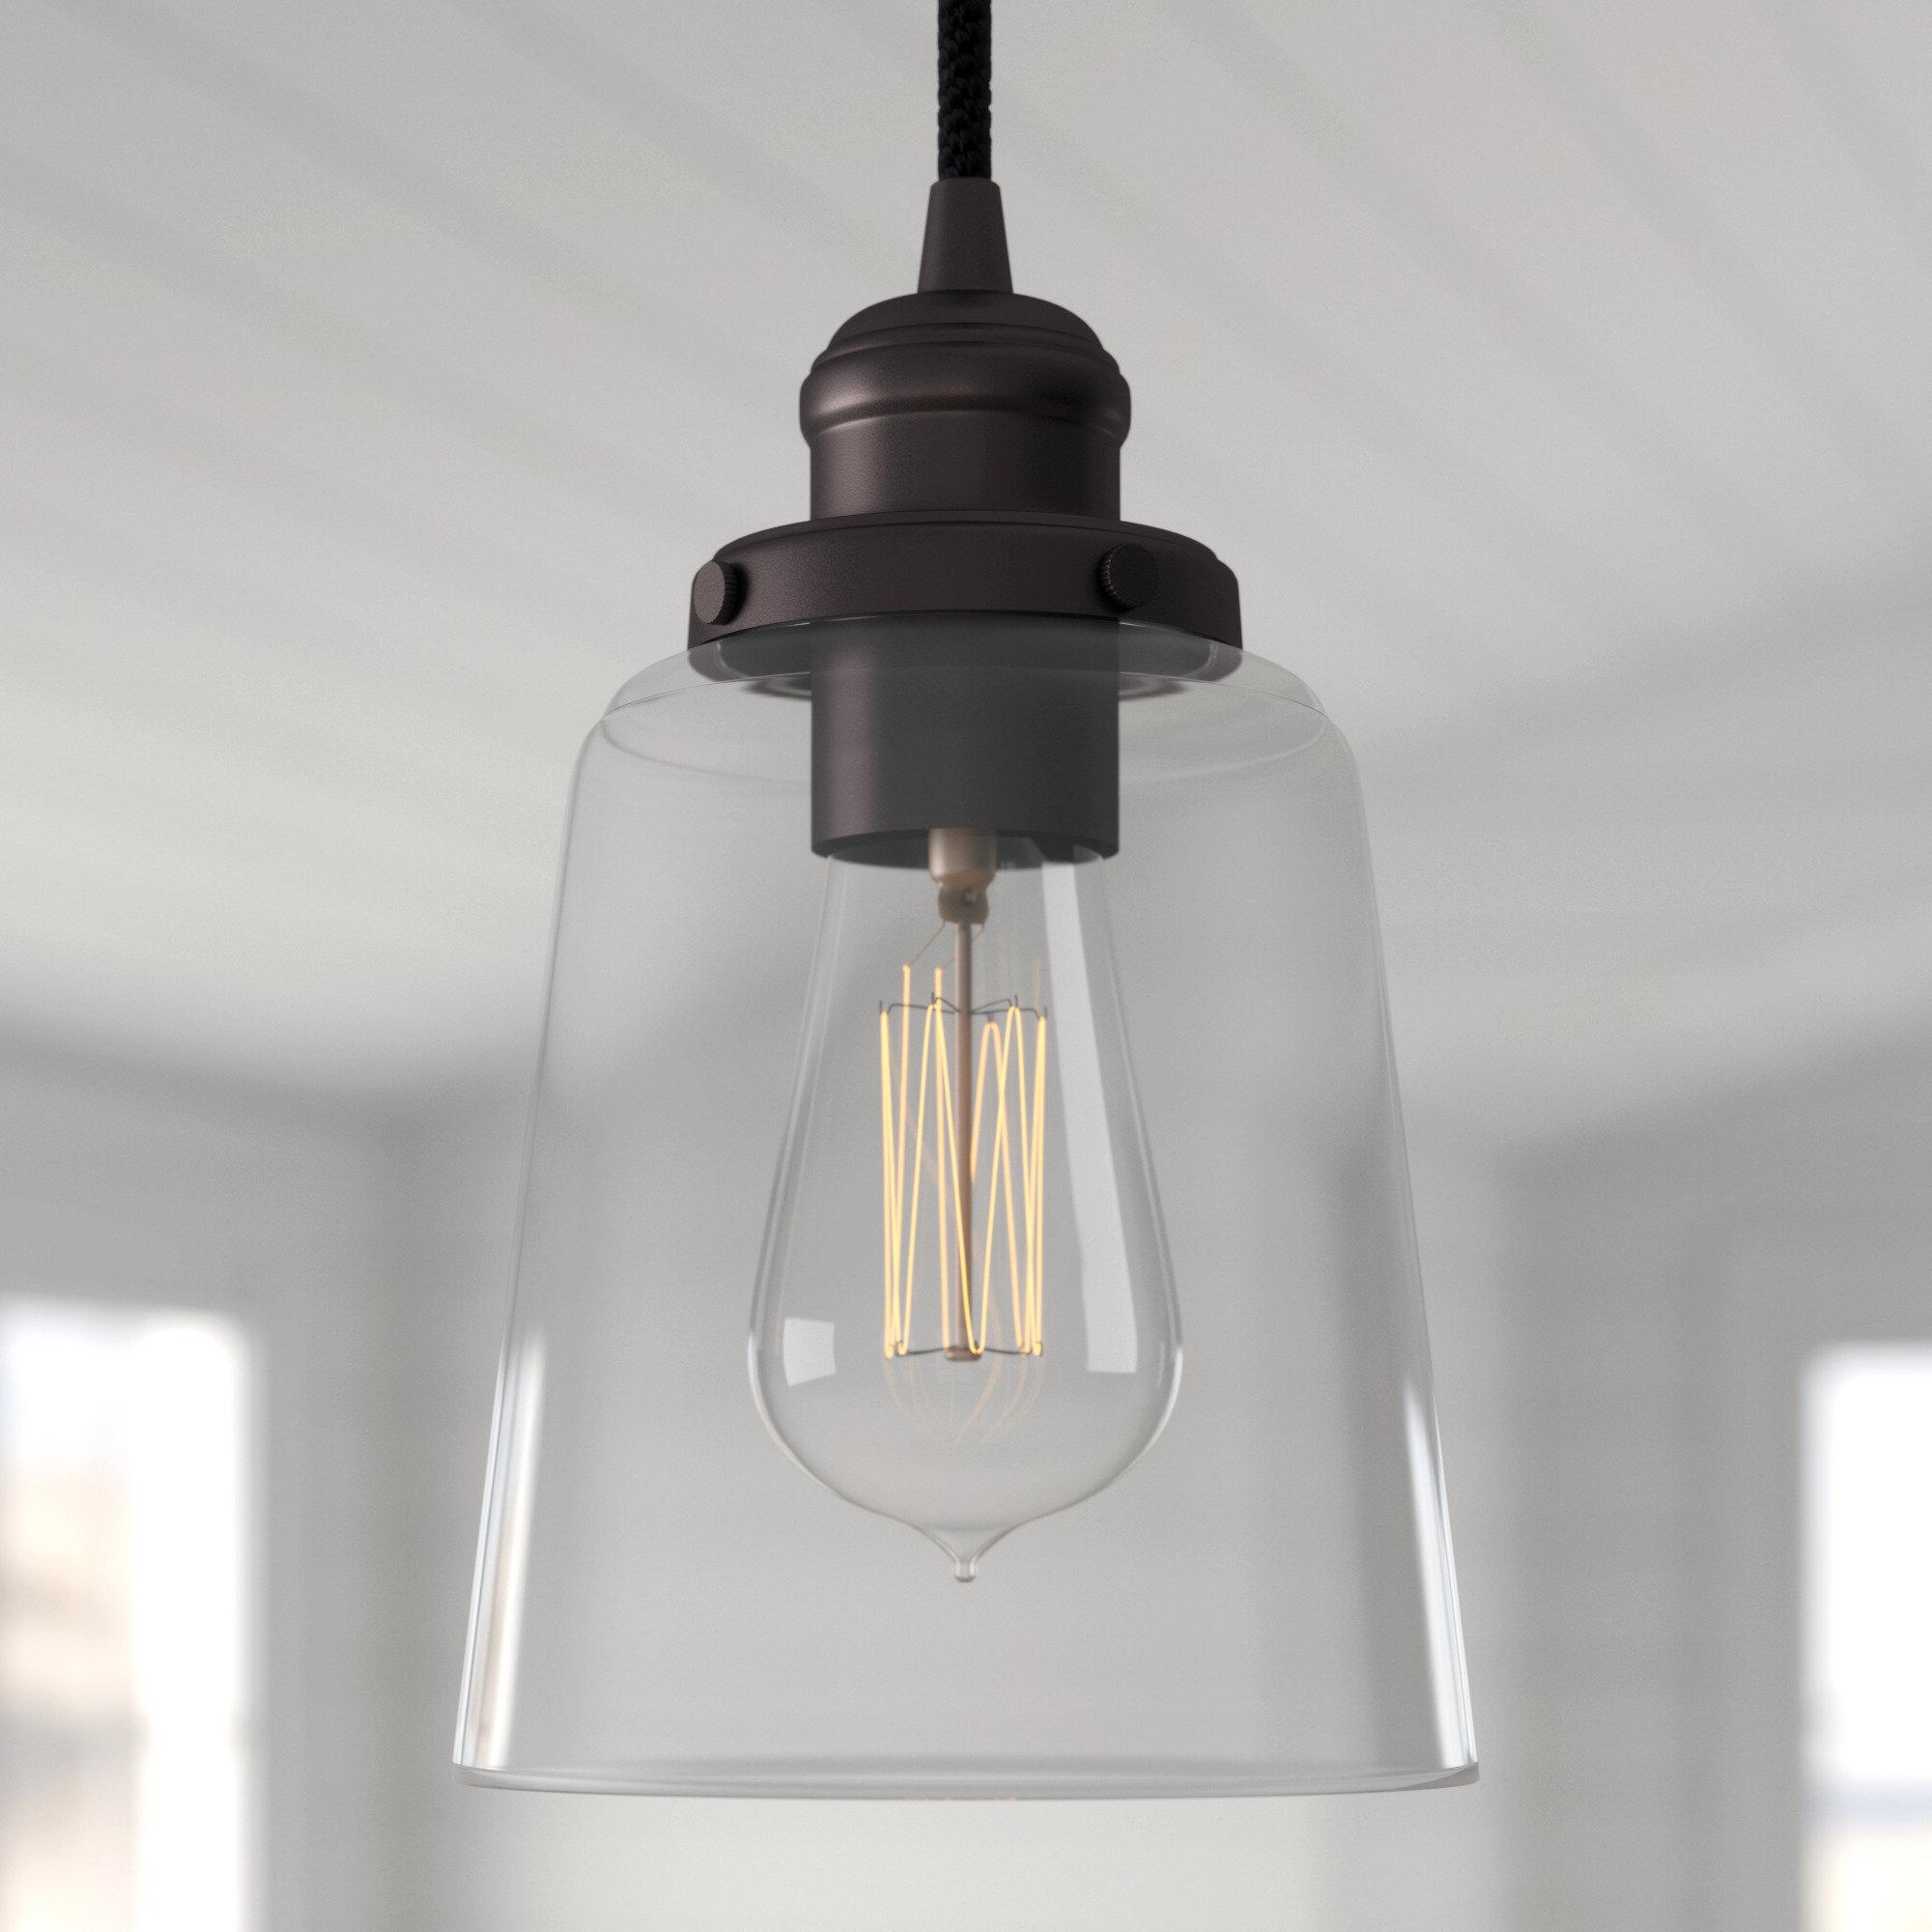 1-Light Cone Pendant for Most Popular Finlayson Iron Gate 1-Light Single Bell Pendants